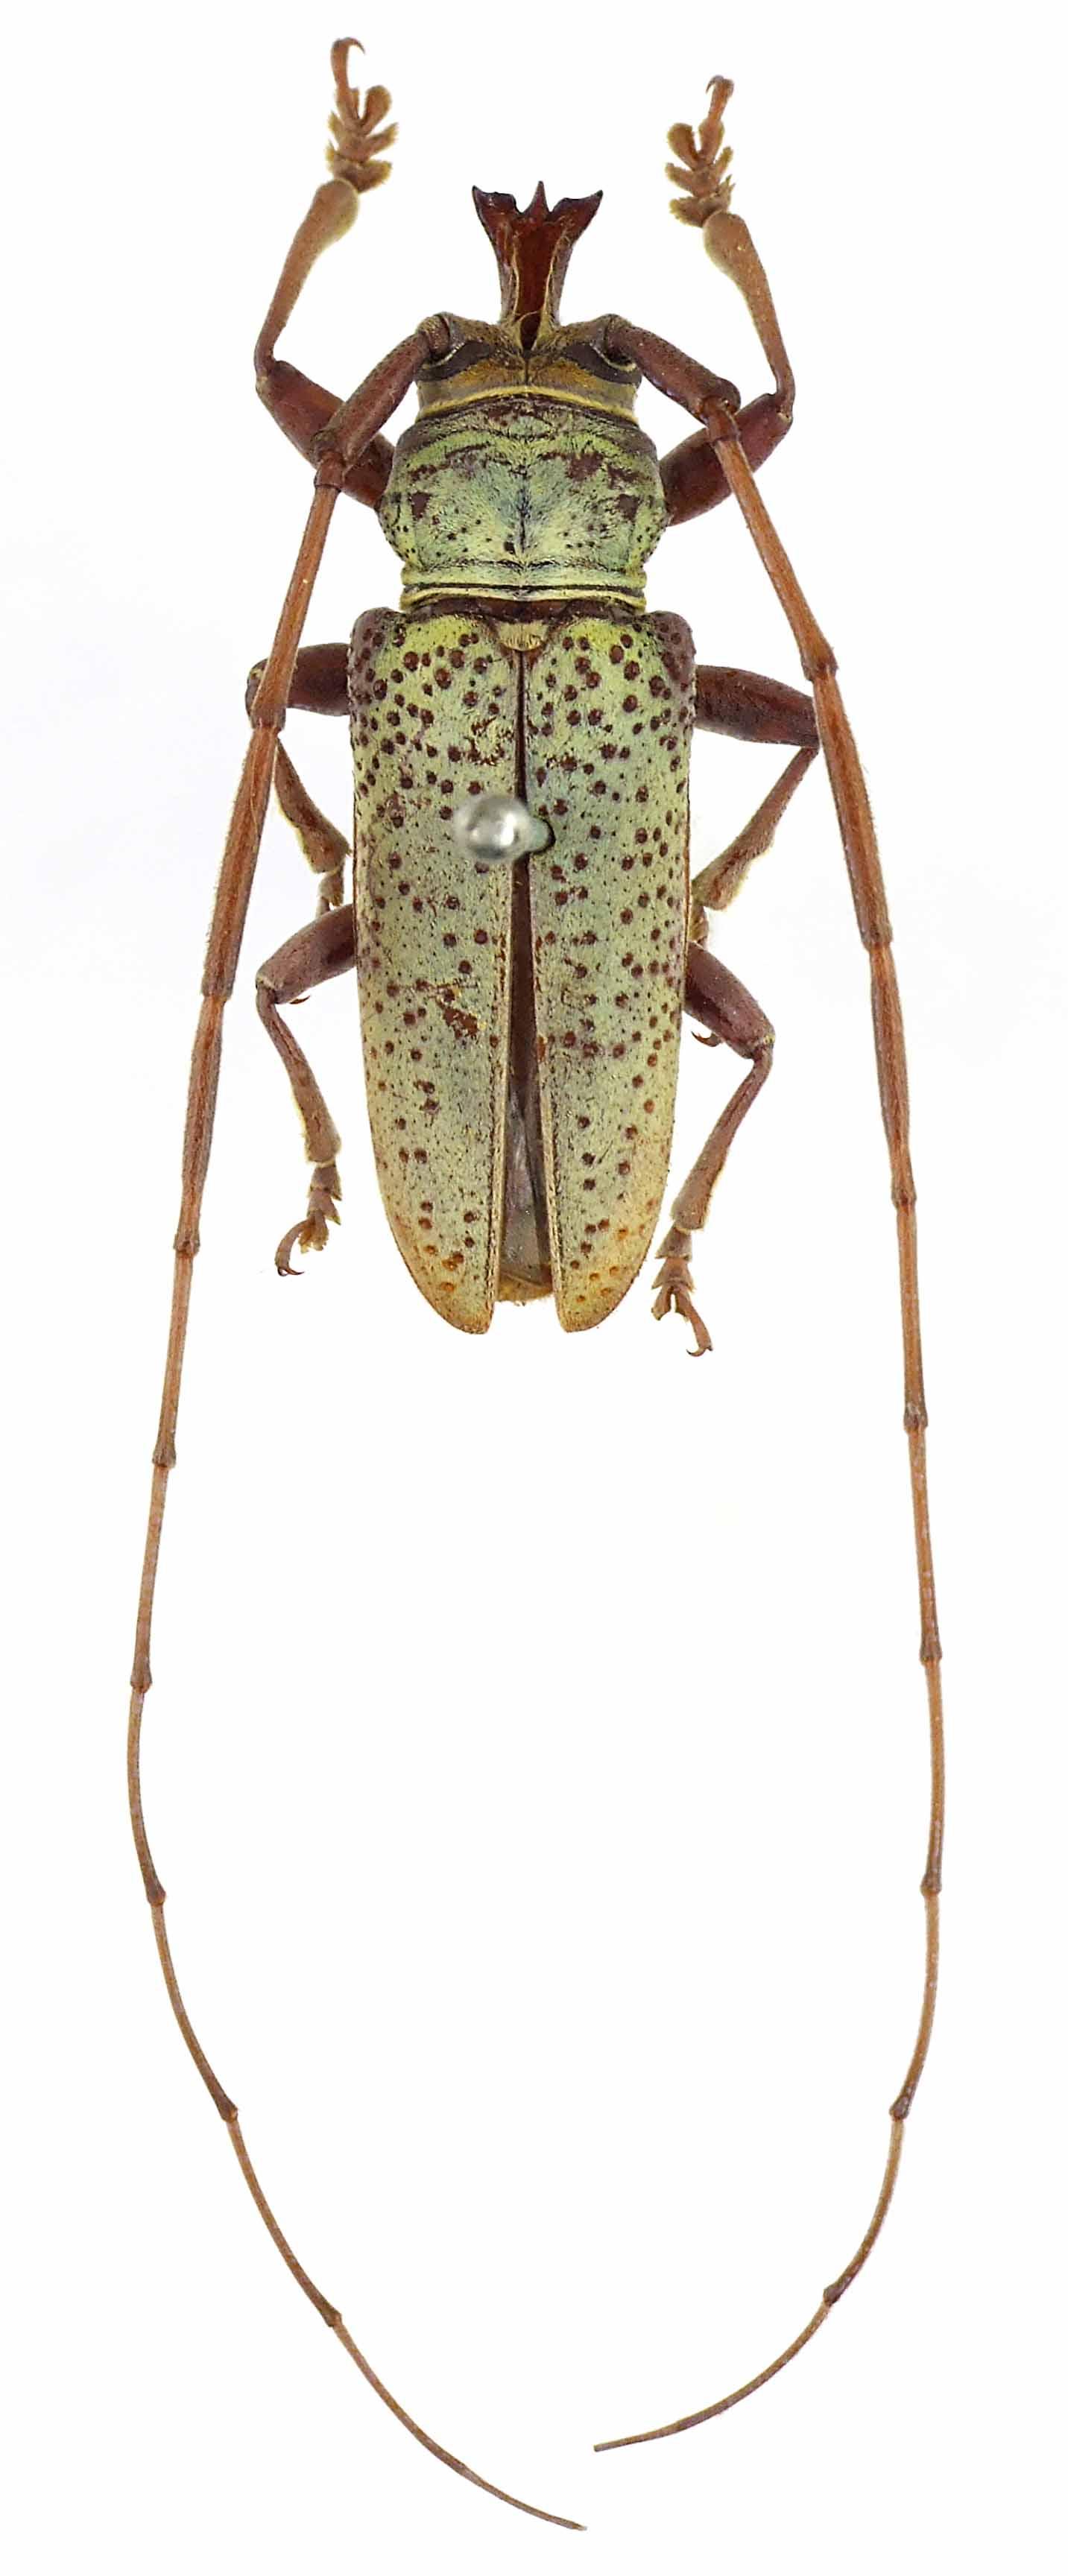 Timoreticus viridis Syn 54403cz07.jpg